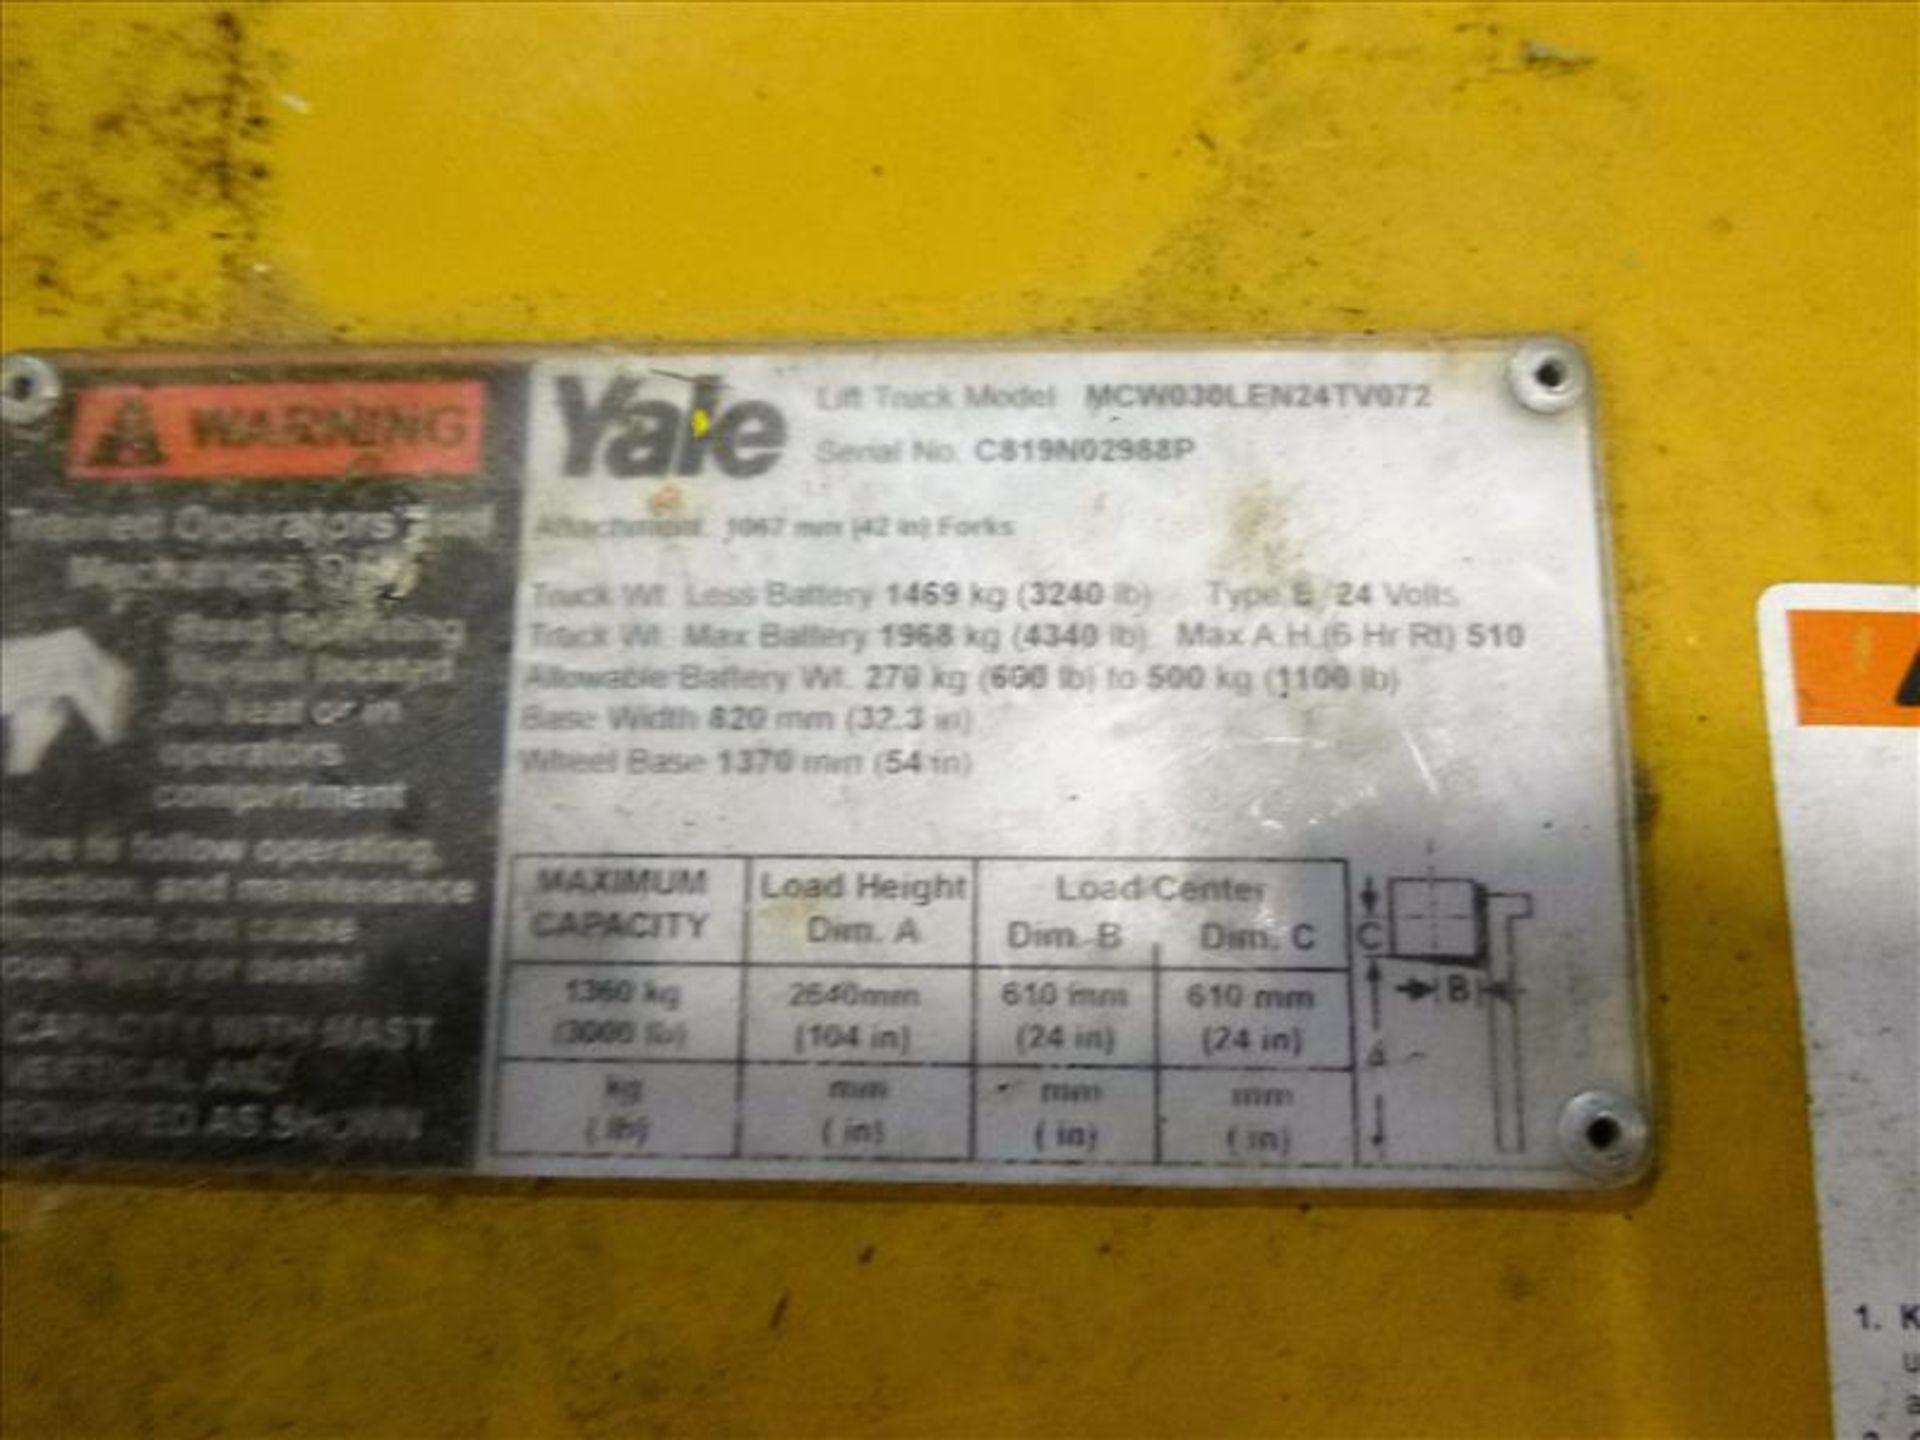 Lot 2022 - Yale walk-behind fork lift truck, mod. MCW030LEN24TV072, ser. no. C819N02988P, 24V electric, 3000